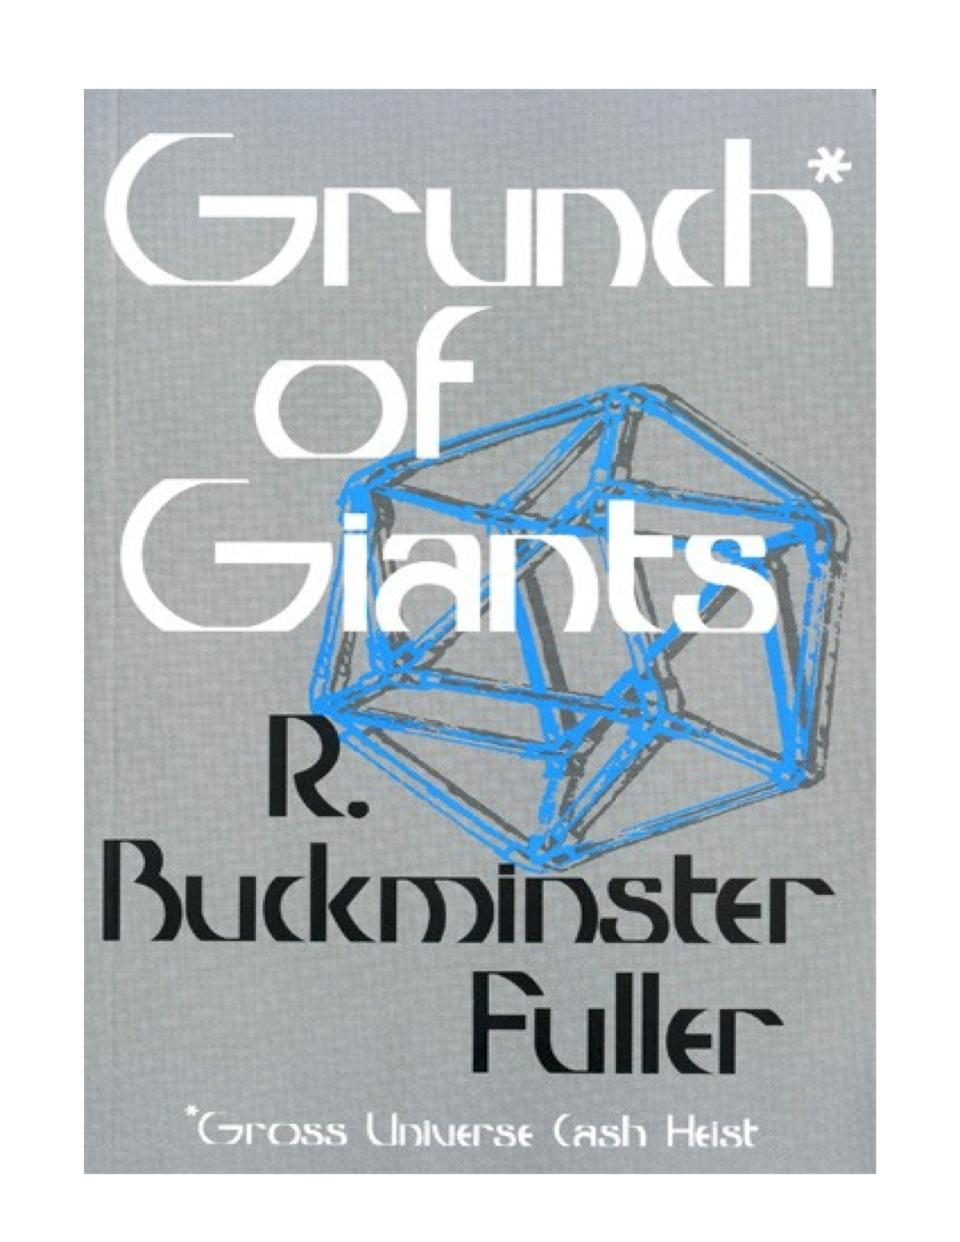 BuckminsterFuller-GrunchOfGiants